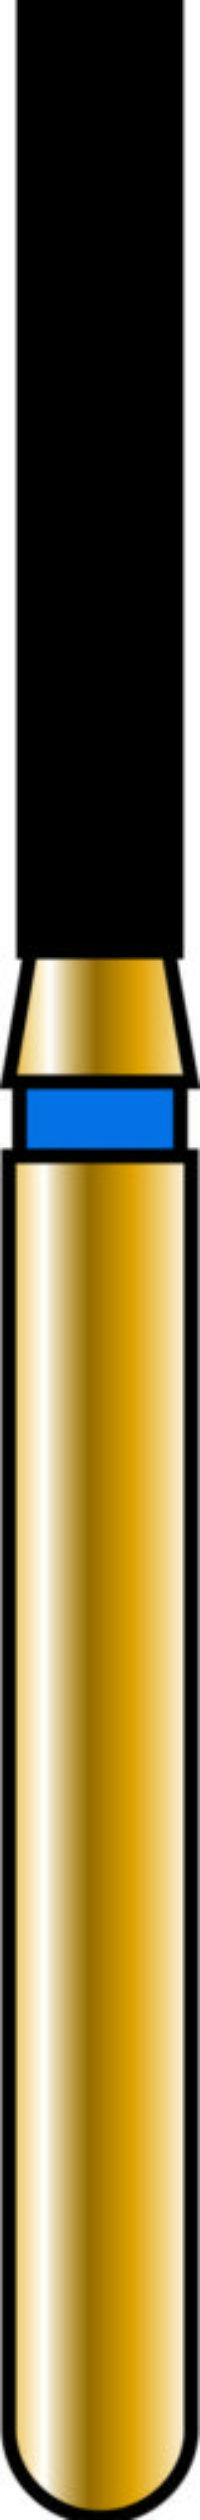 Flat End Cylinder 14-8mm Gold Diamond Bur